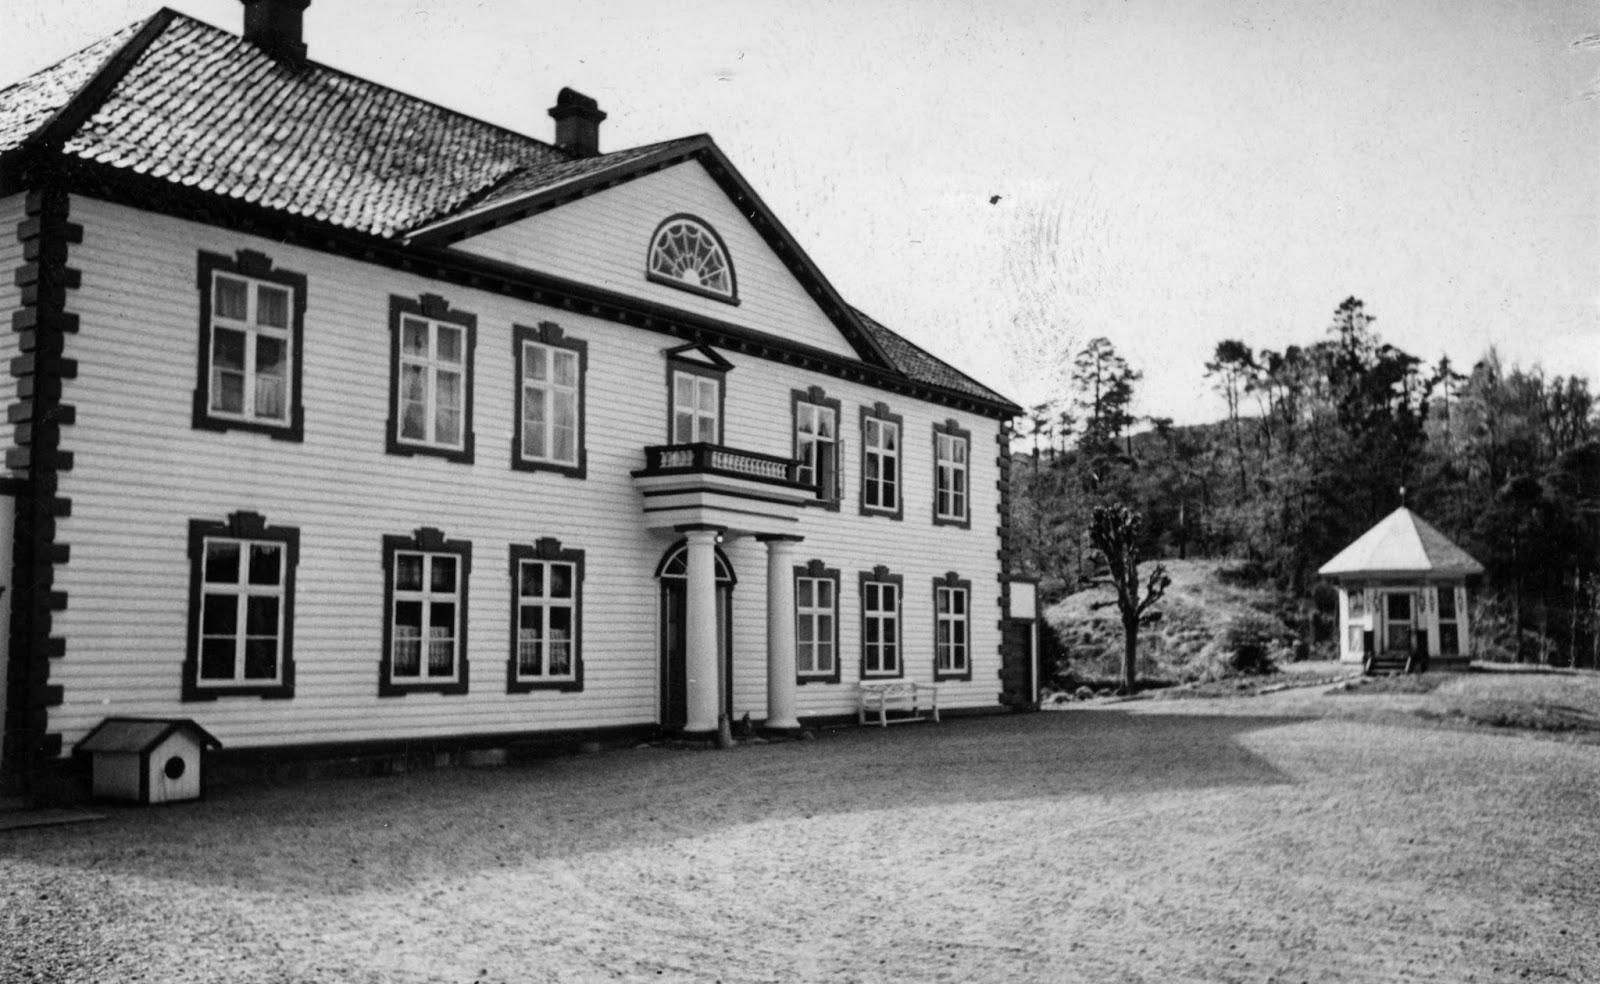 Sejarah Stromsbu (Strømsbu)